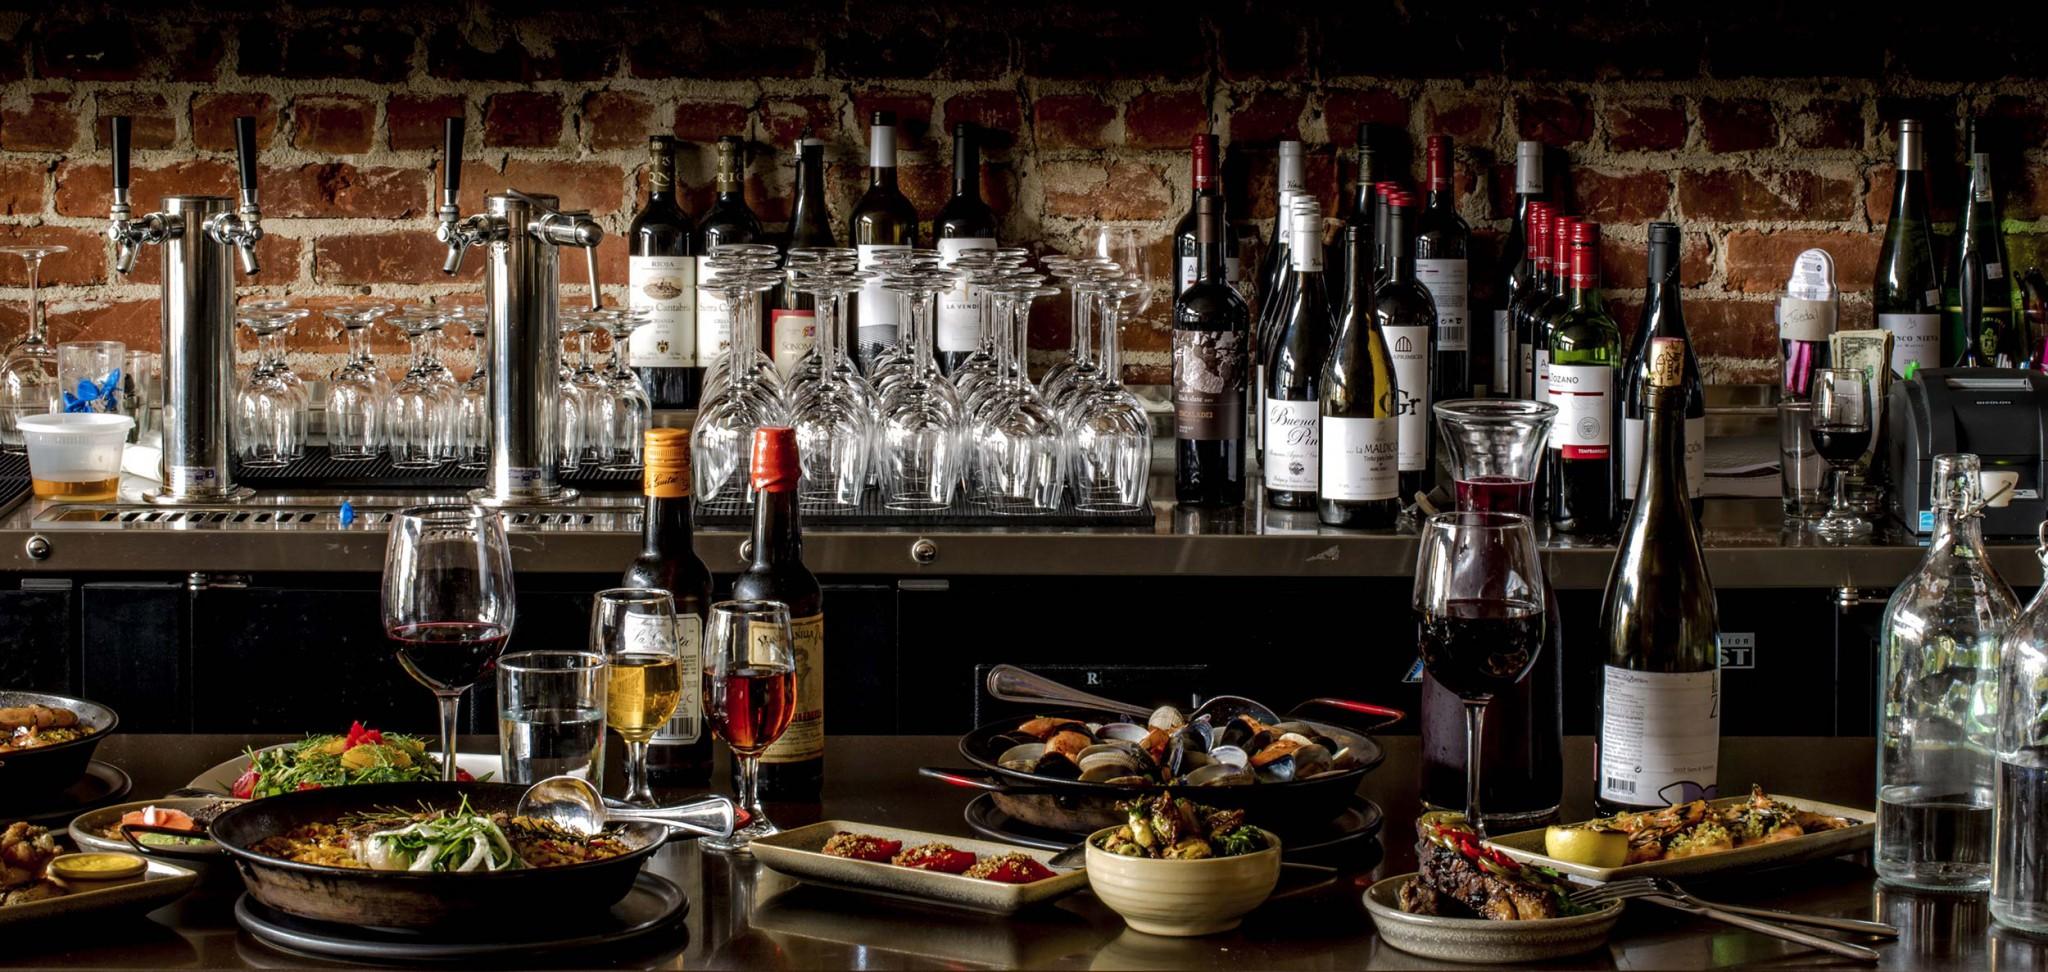 Super La Marcha Tapas Bar Spanish Restaurant In Berkeley Download Free Architecture Designs Scobabritishbridgeorg